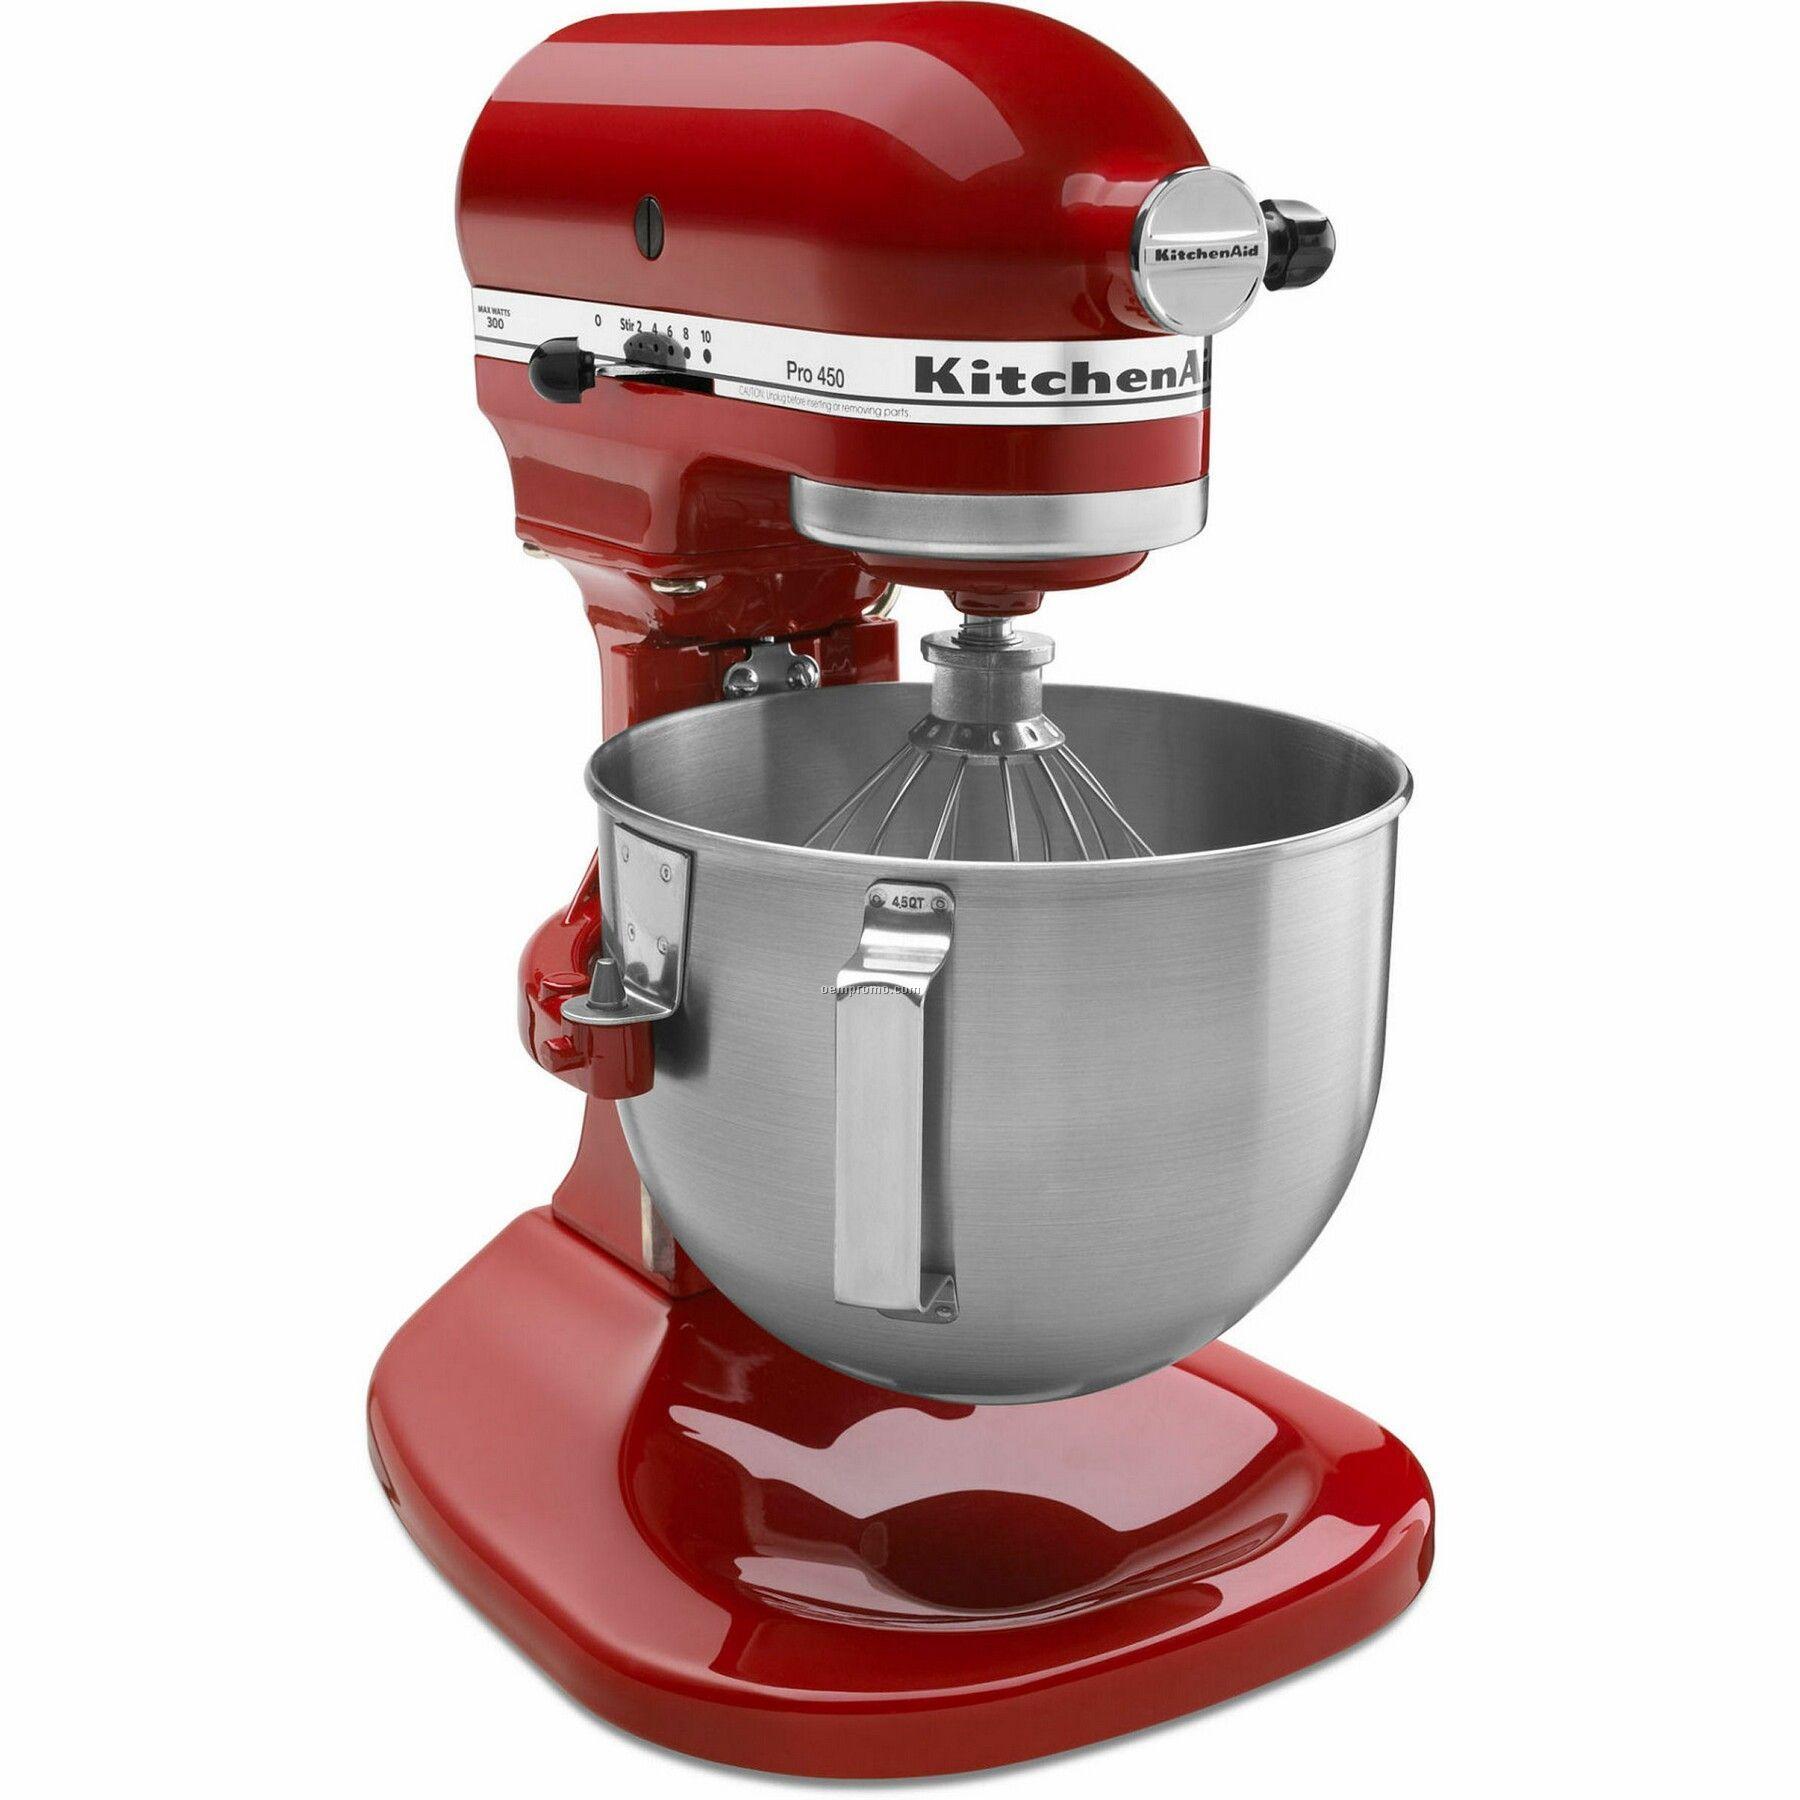 Ki Ki Kitchenaid Mixer Colors - Kitchenaid food mixer photo 1 kitchenaid food mixer photo 1